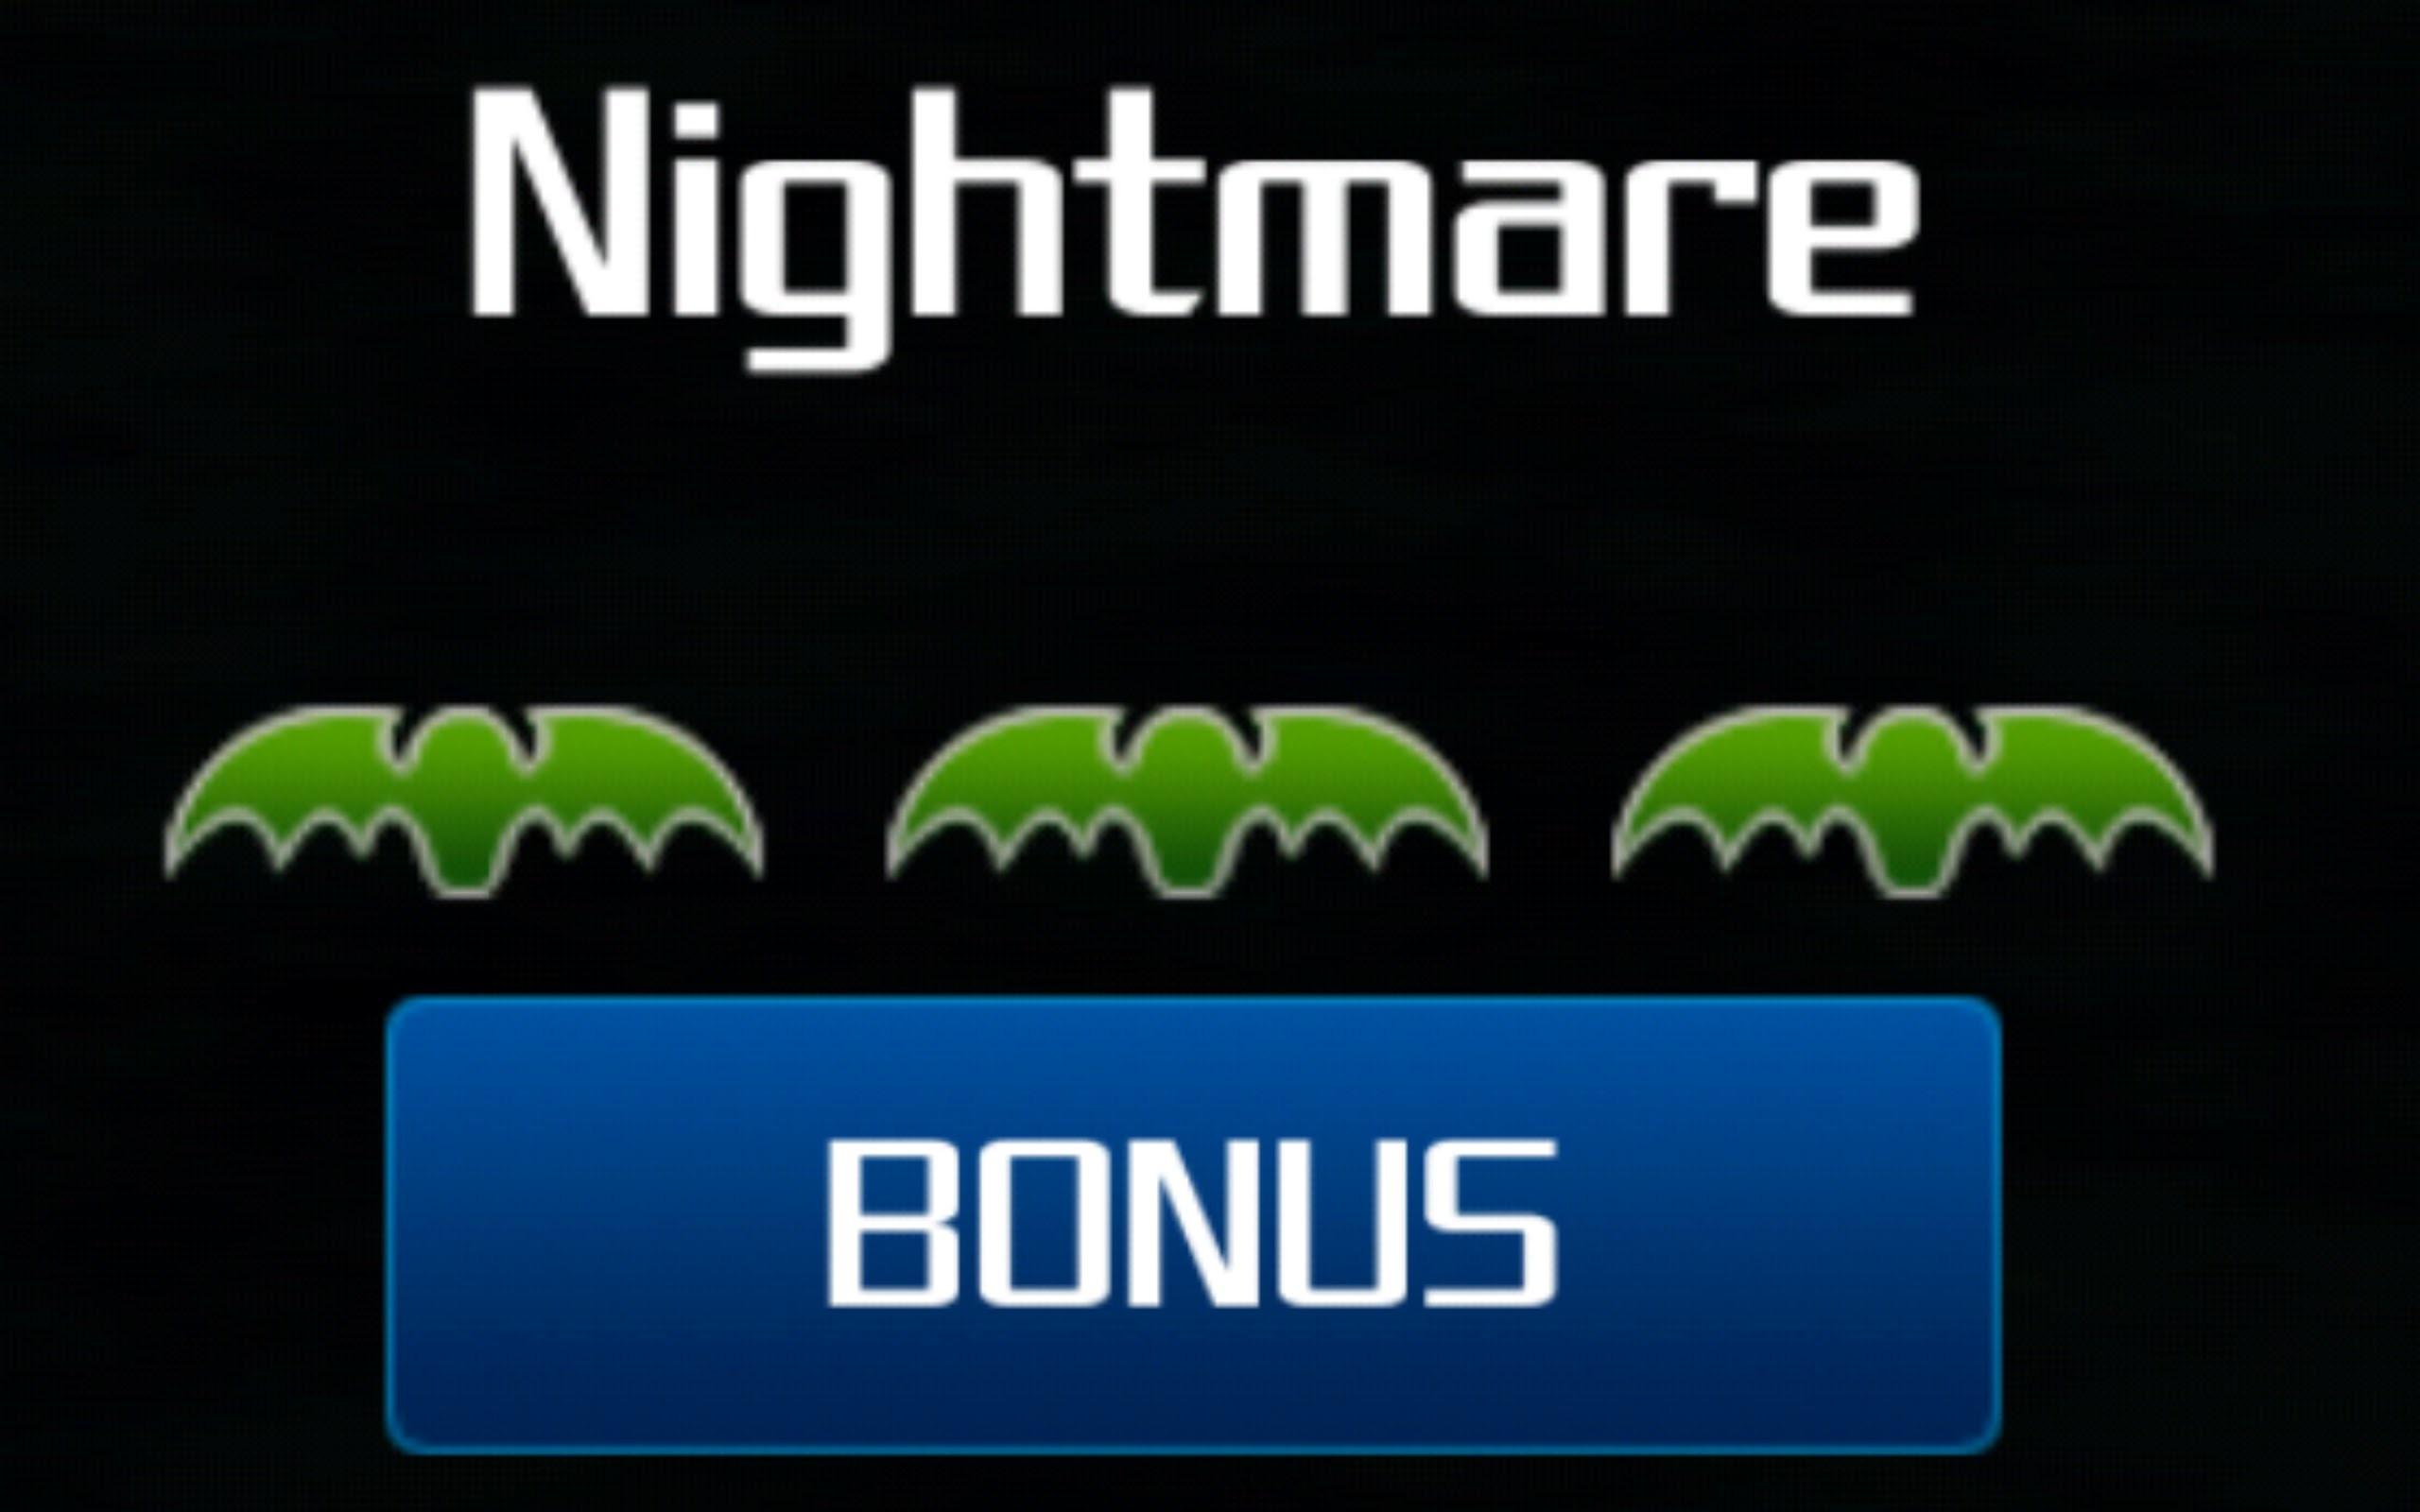 Hail to the King: Death Bat Walkthrough Nightmare Bonus Round